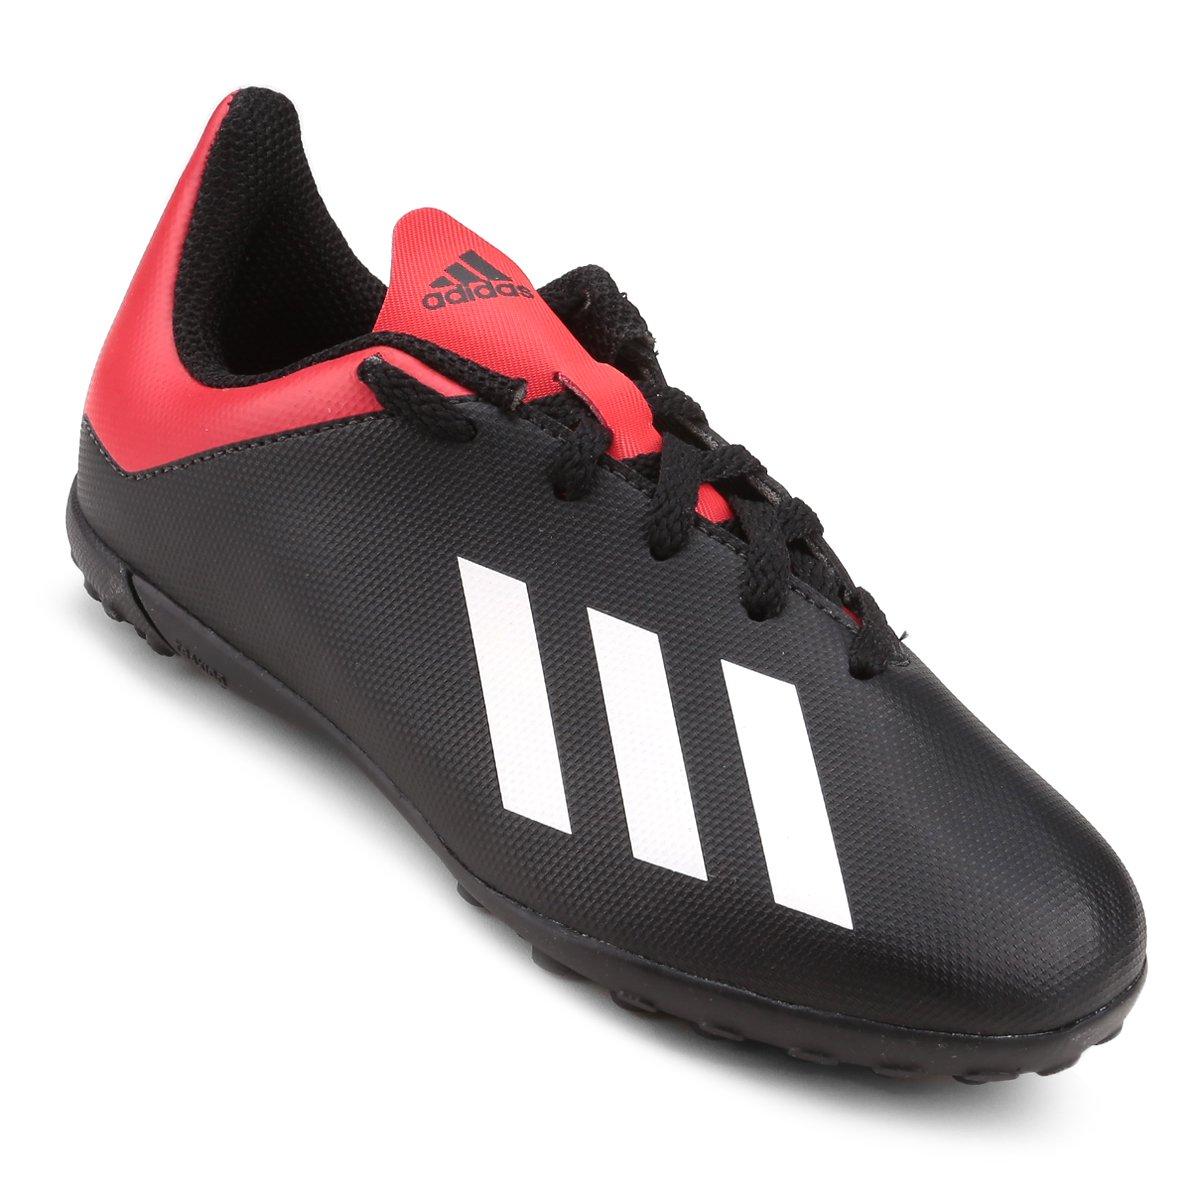 6260da29647 Chuteira Society Infantil Adidas X 18 4 TF - Compre Agora